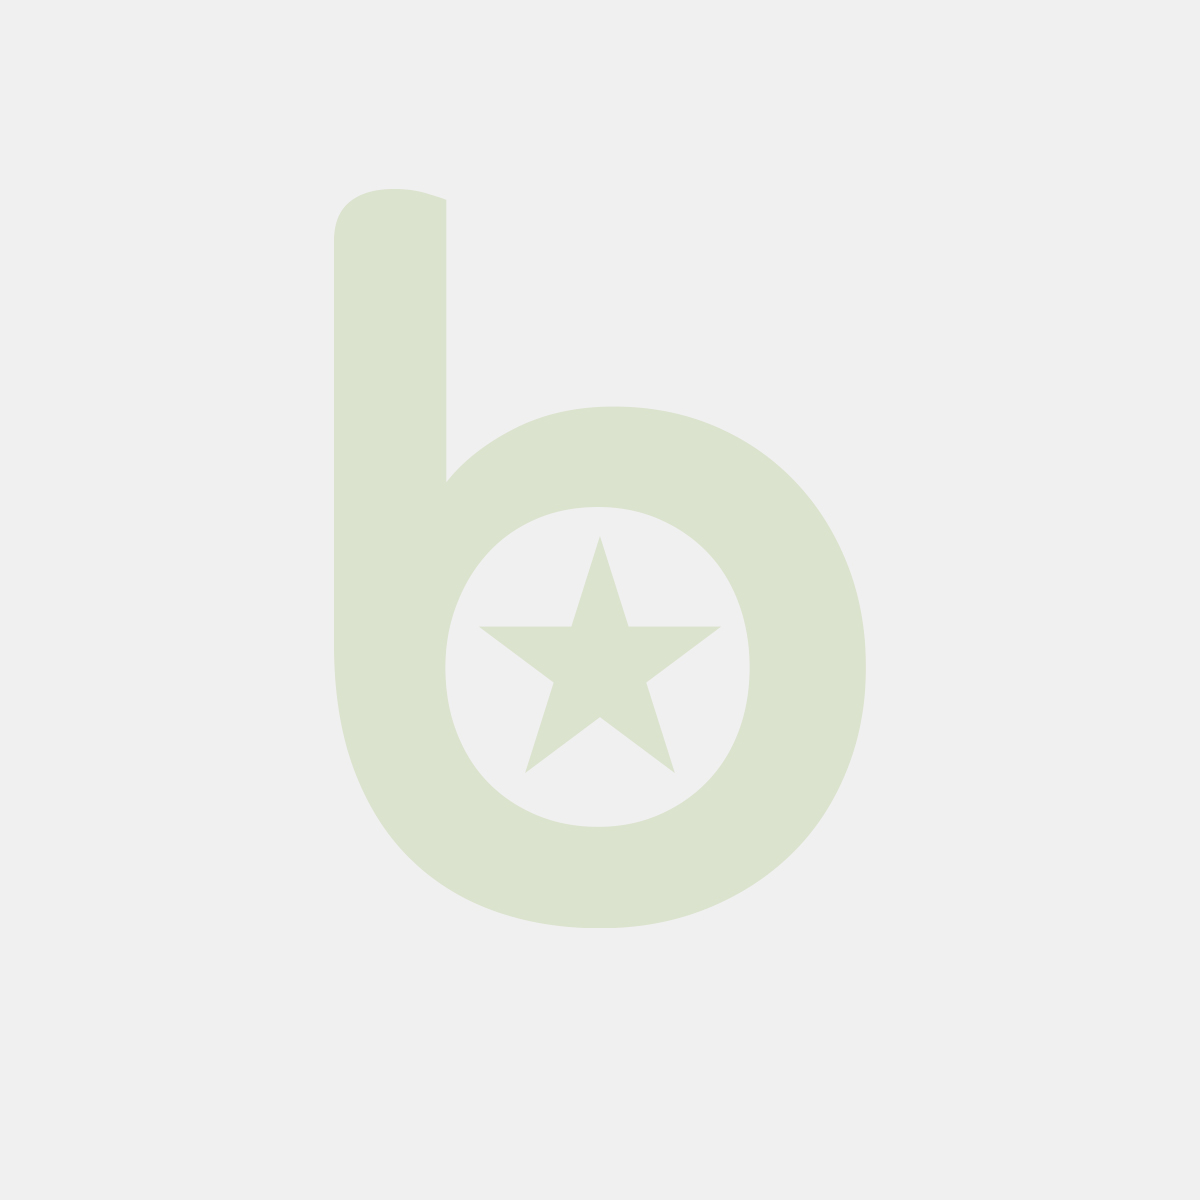 Kołozeszyt A5 Interdruk, 80 kartek, miękka oprawa